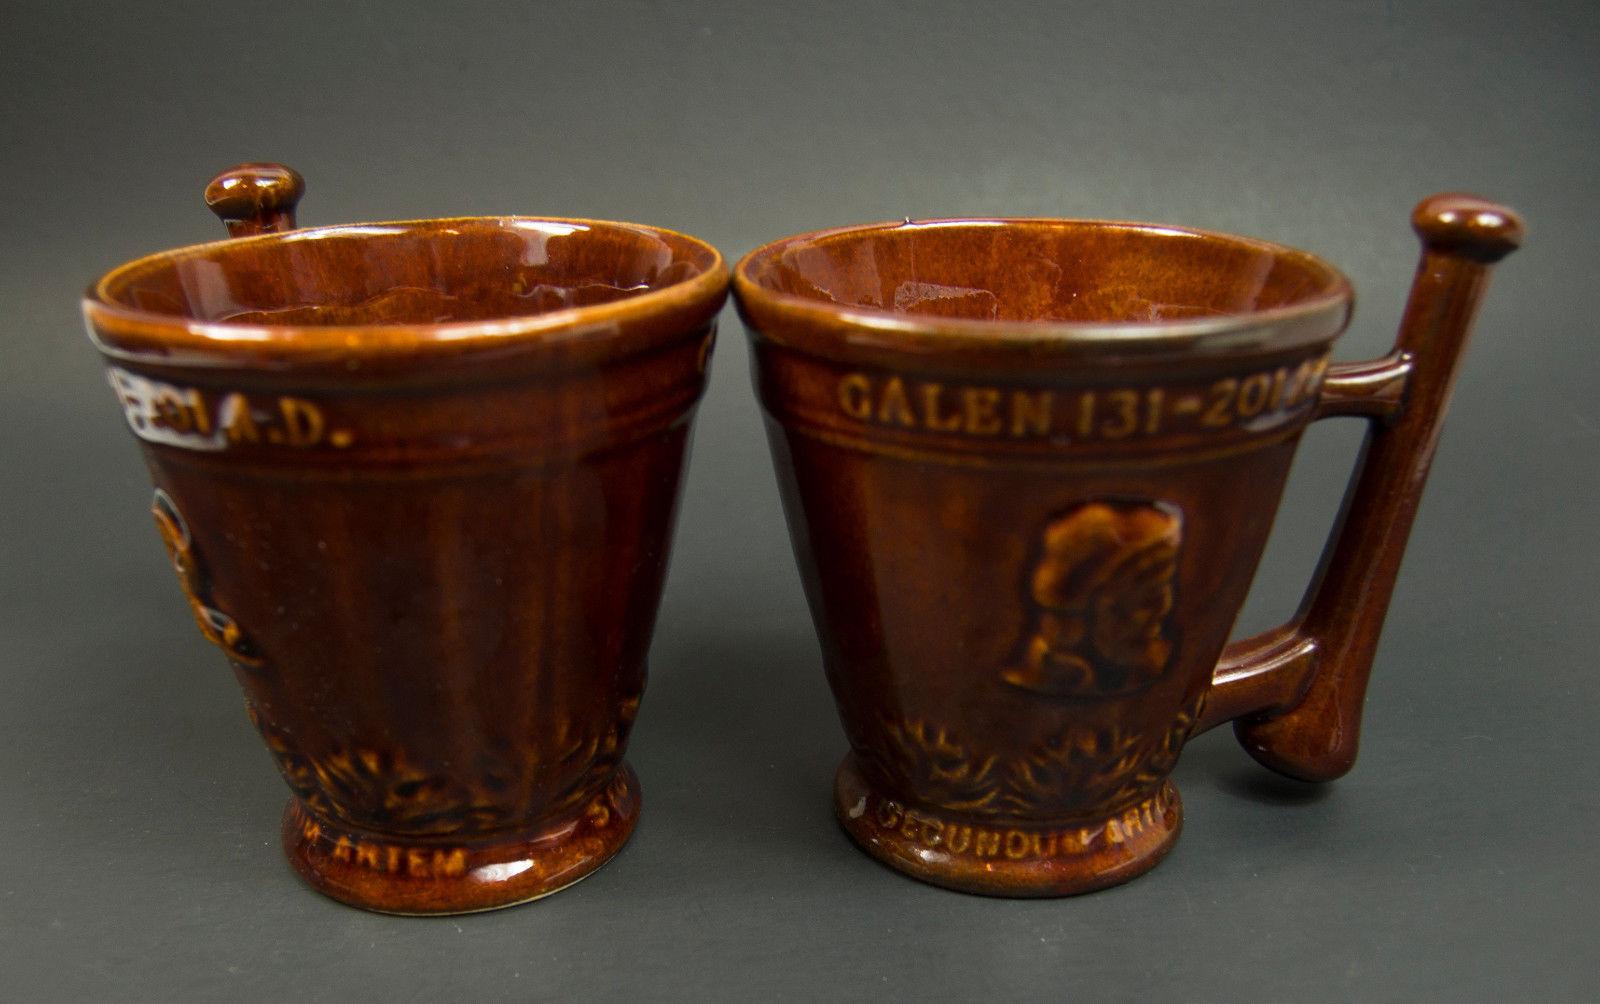 Vintage McCoy Schering  Coricidin RX Pharmacy Advertising Mug Cup Lot of 2